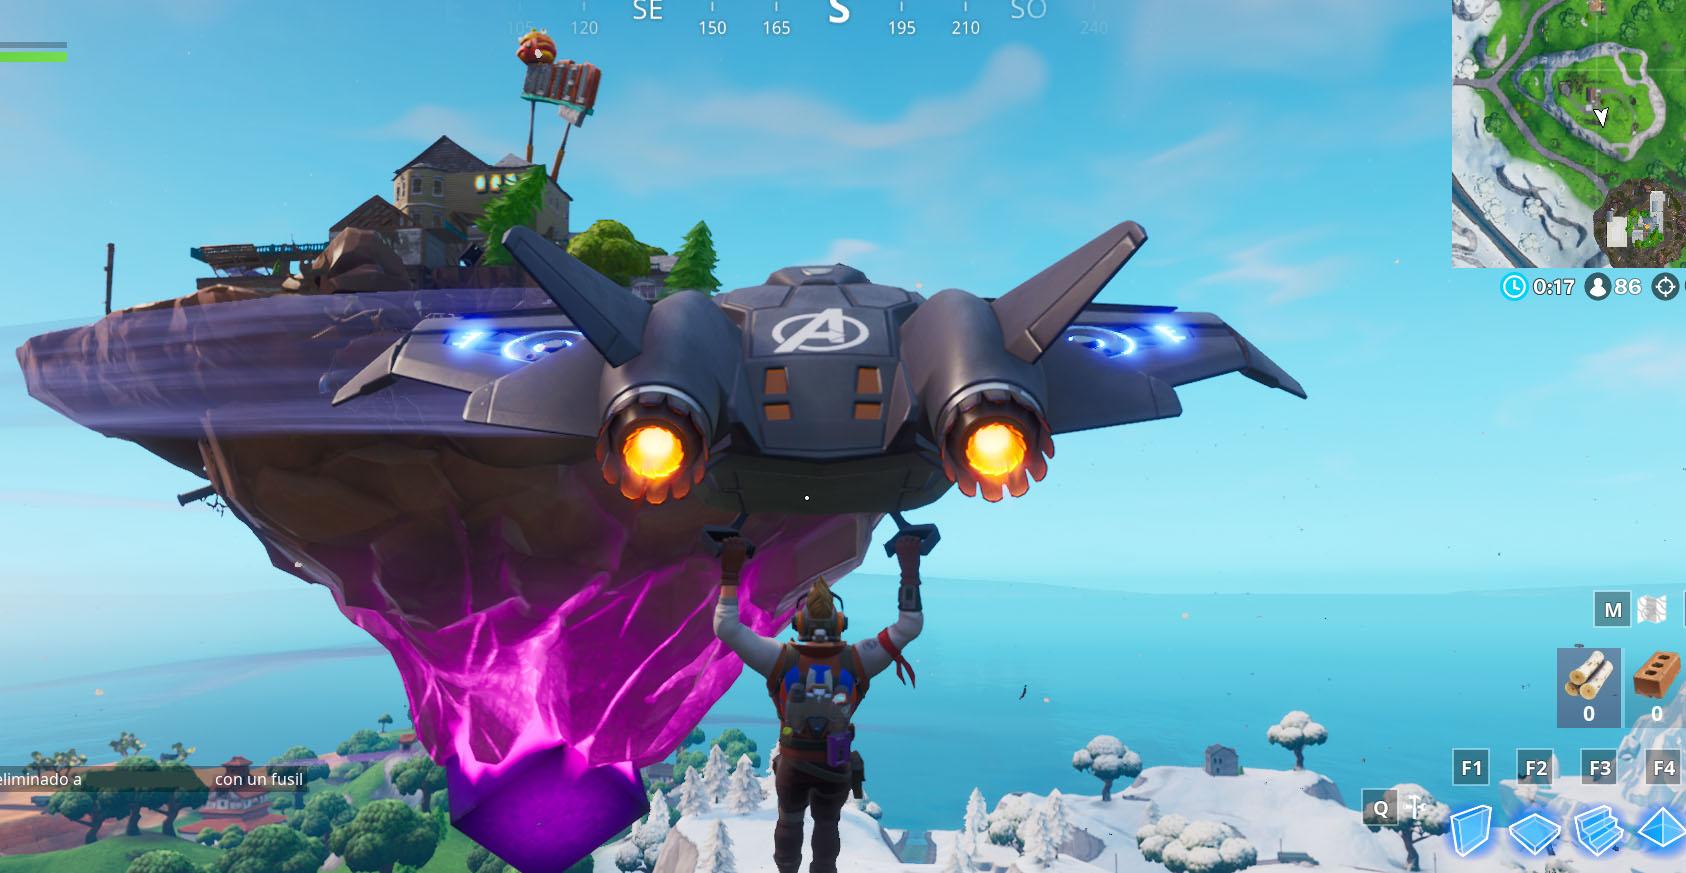 La Isla Flotante de Kevin el Cubo regresa a Fortnite sobre Latifundio Letal